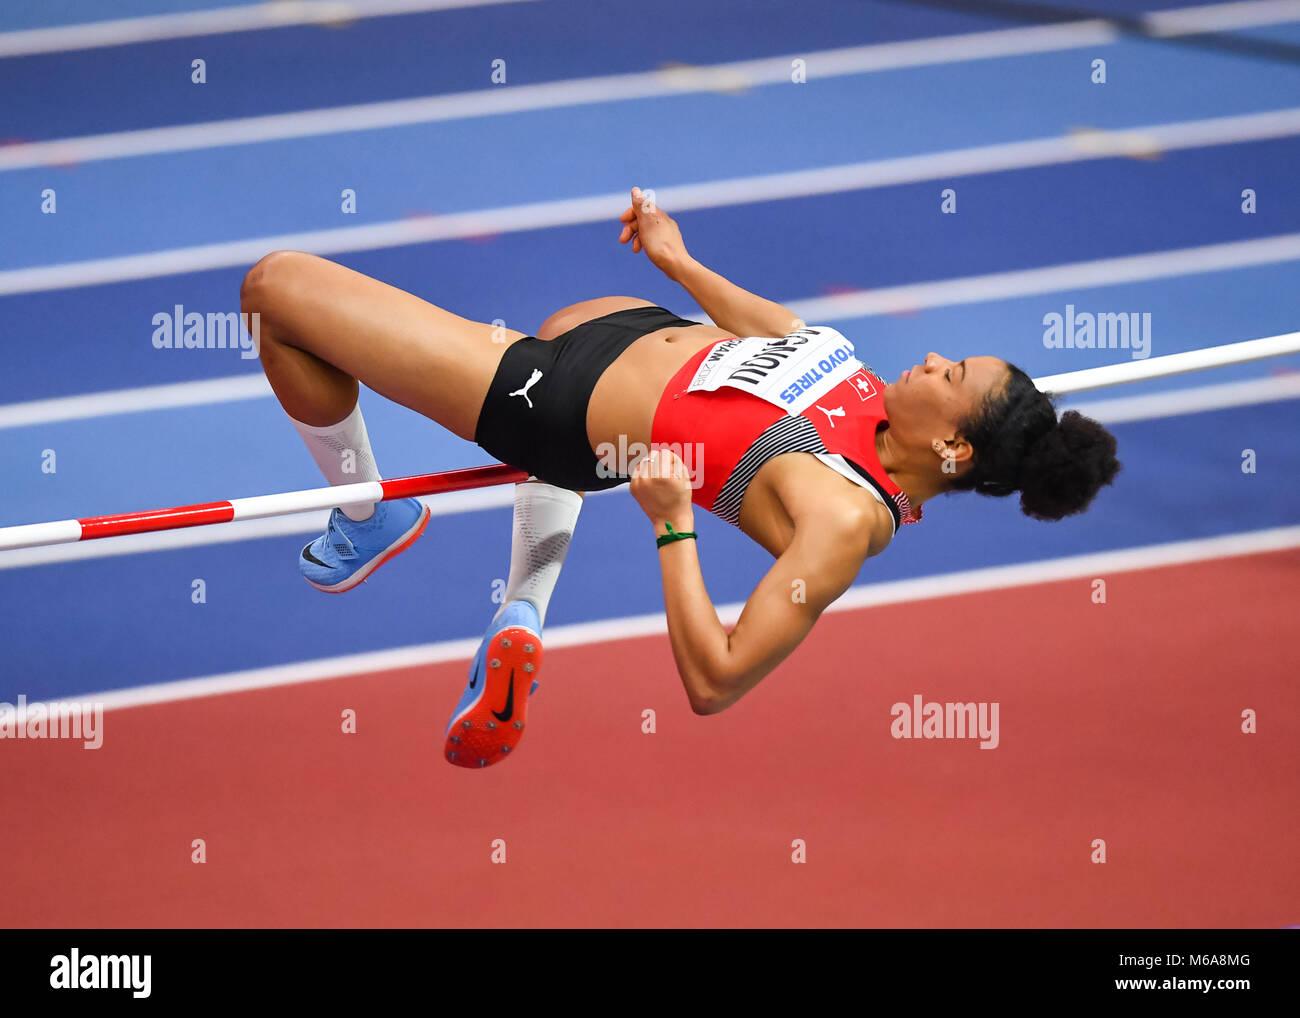 Birmingham, UK. 2nd March, 2018. Birmingham, UK. 2nd Mar, 2018. Caroline Agnou (SUI) in Women's High Jump Pentathlon - Stock Image